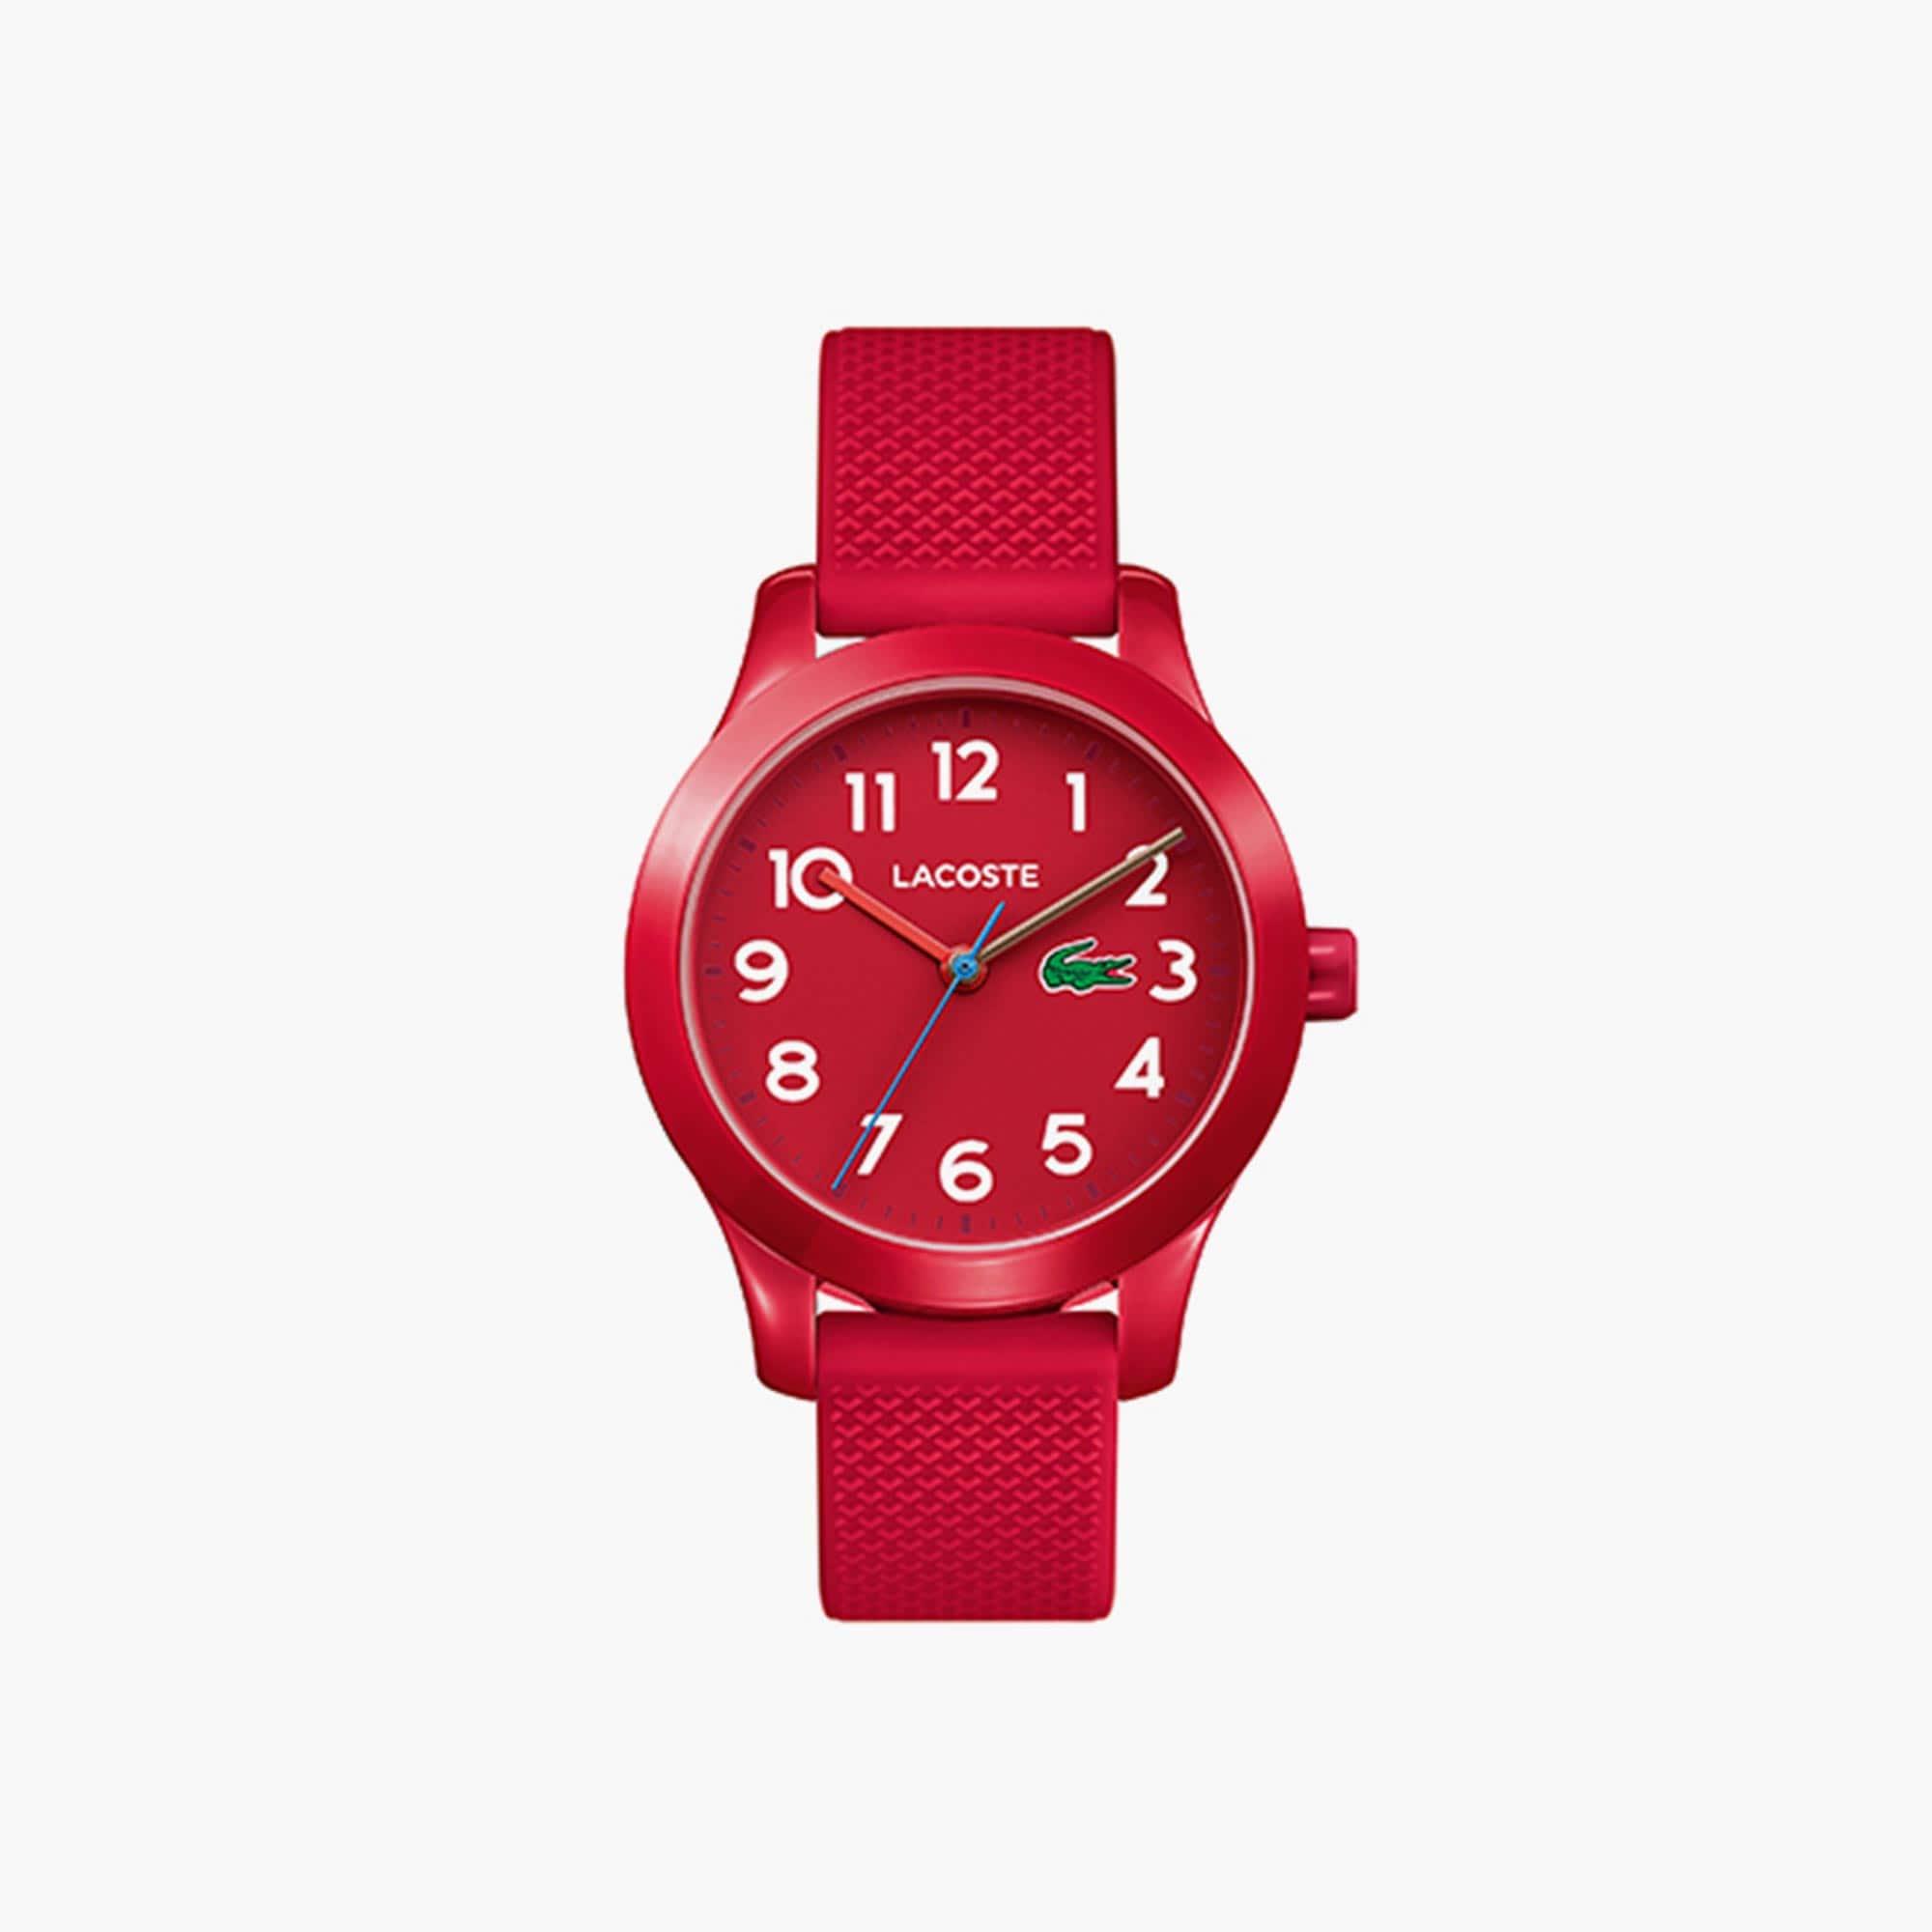 Rotem Lacoste Silikonband 12 12 Mit Kinderuhr 7gvby6Yf